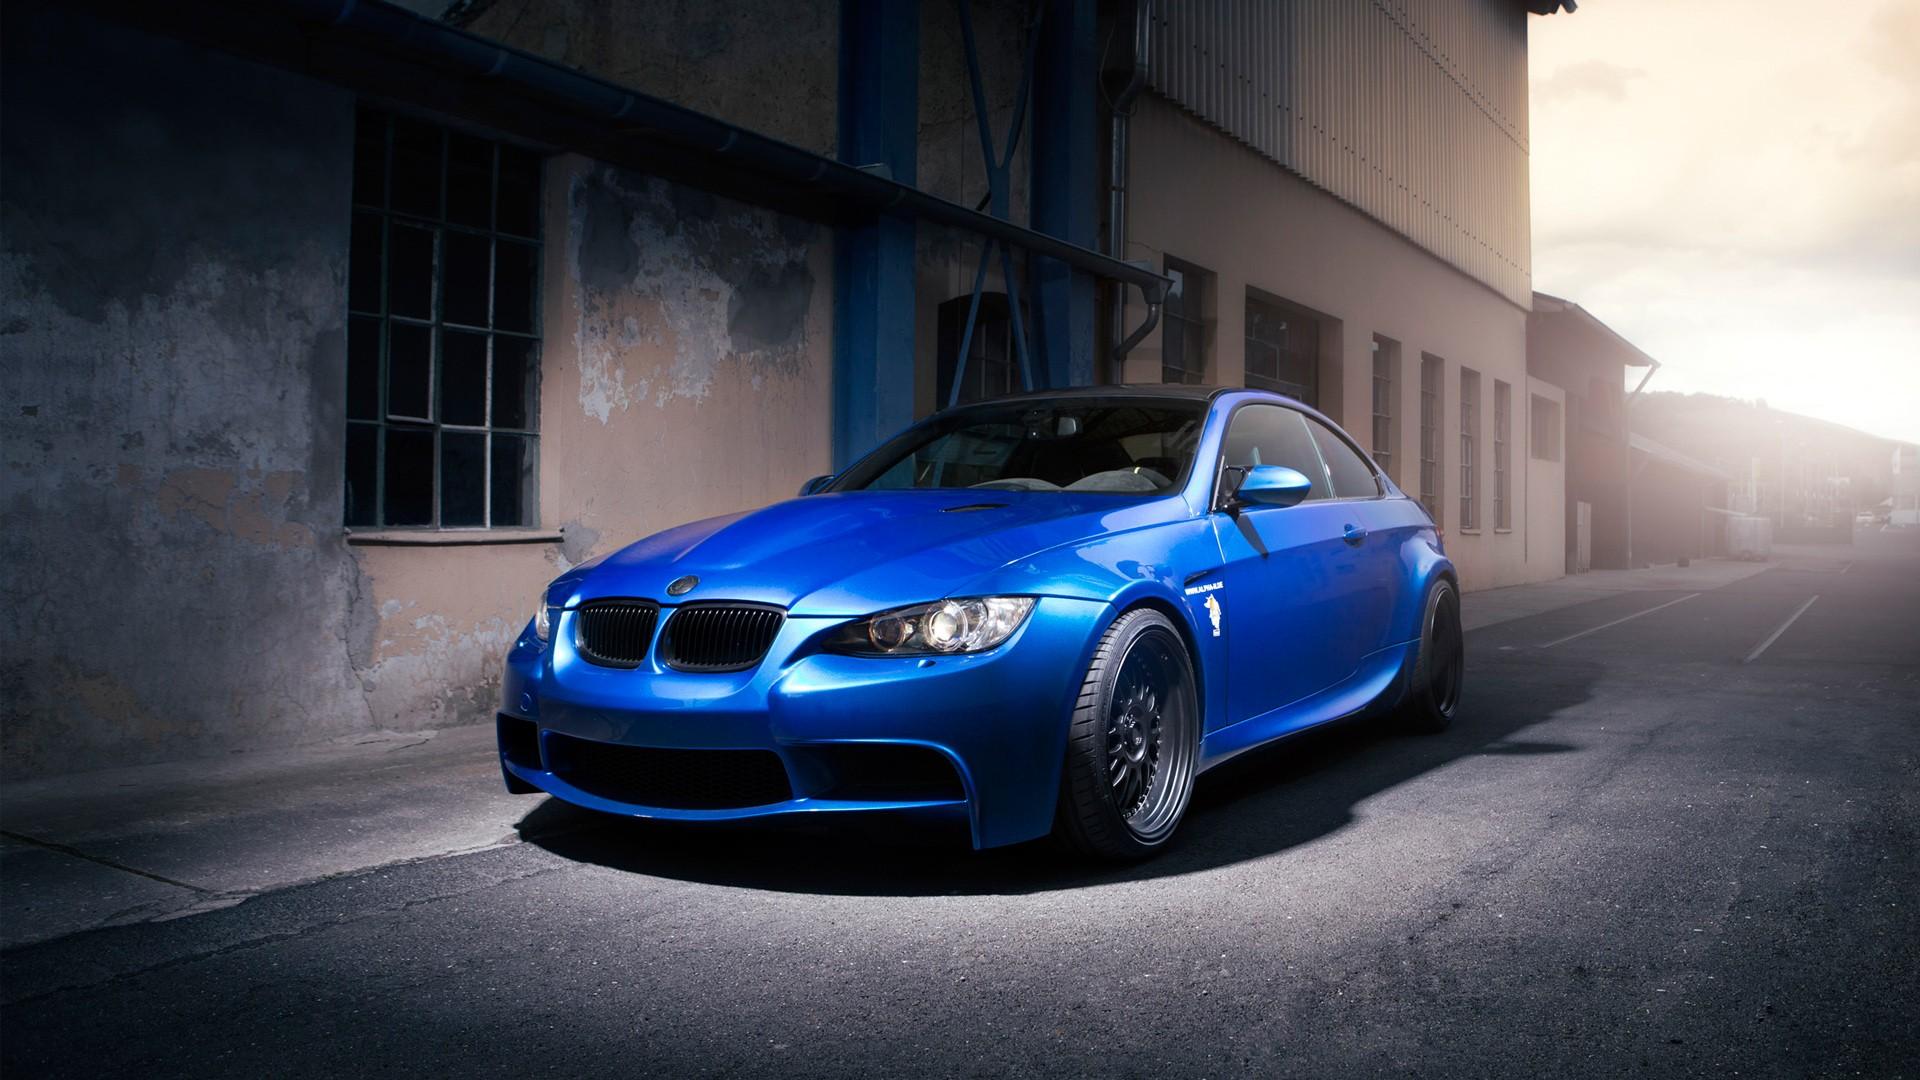 Bmw Blue Cars Wallpapers Bmw M3 Bt92 By Alpha N Performance 2013 Wallpaper Hd Car